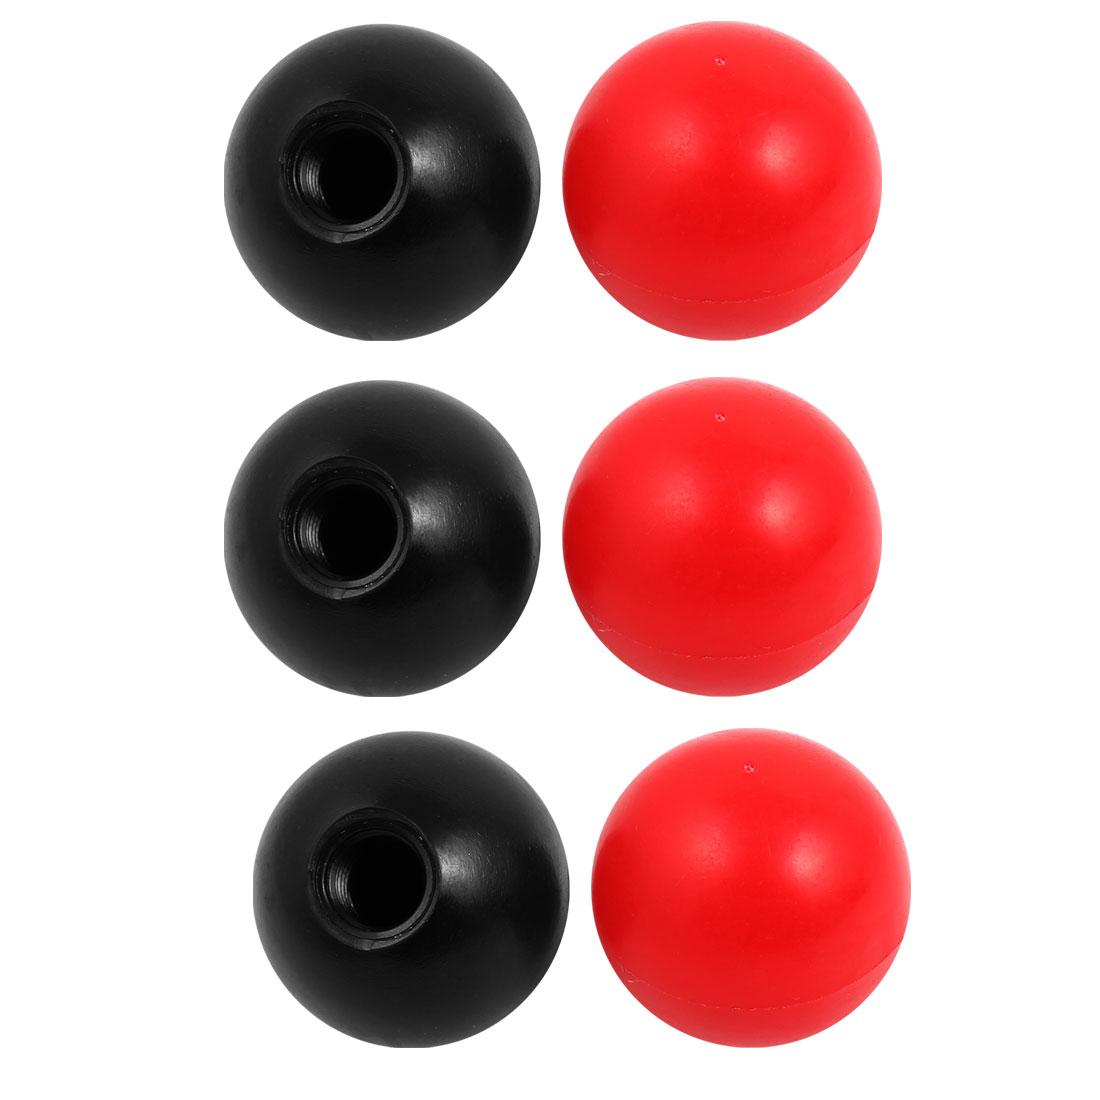 6Pcs Plastic Round Handle Ball Knob M12 Threaded 40mm Dia Mixed Color